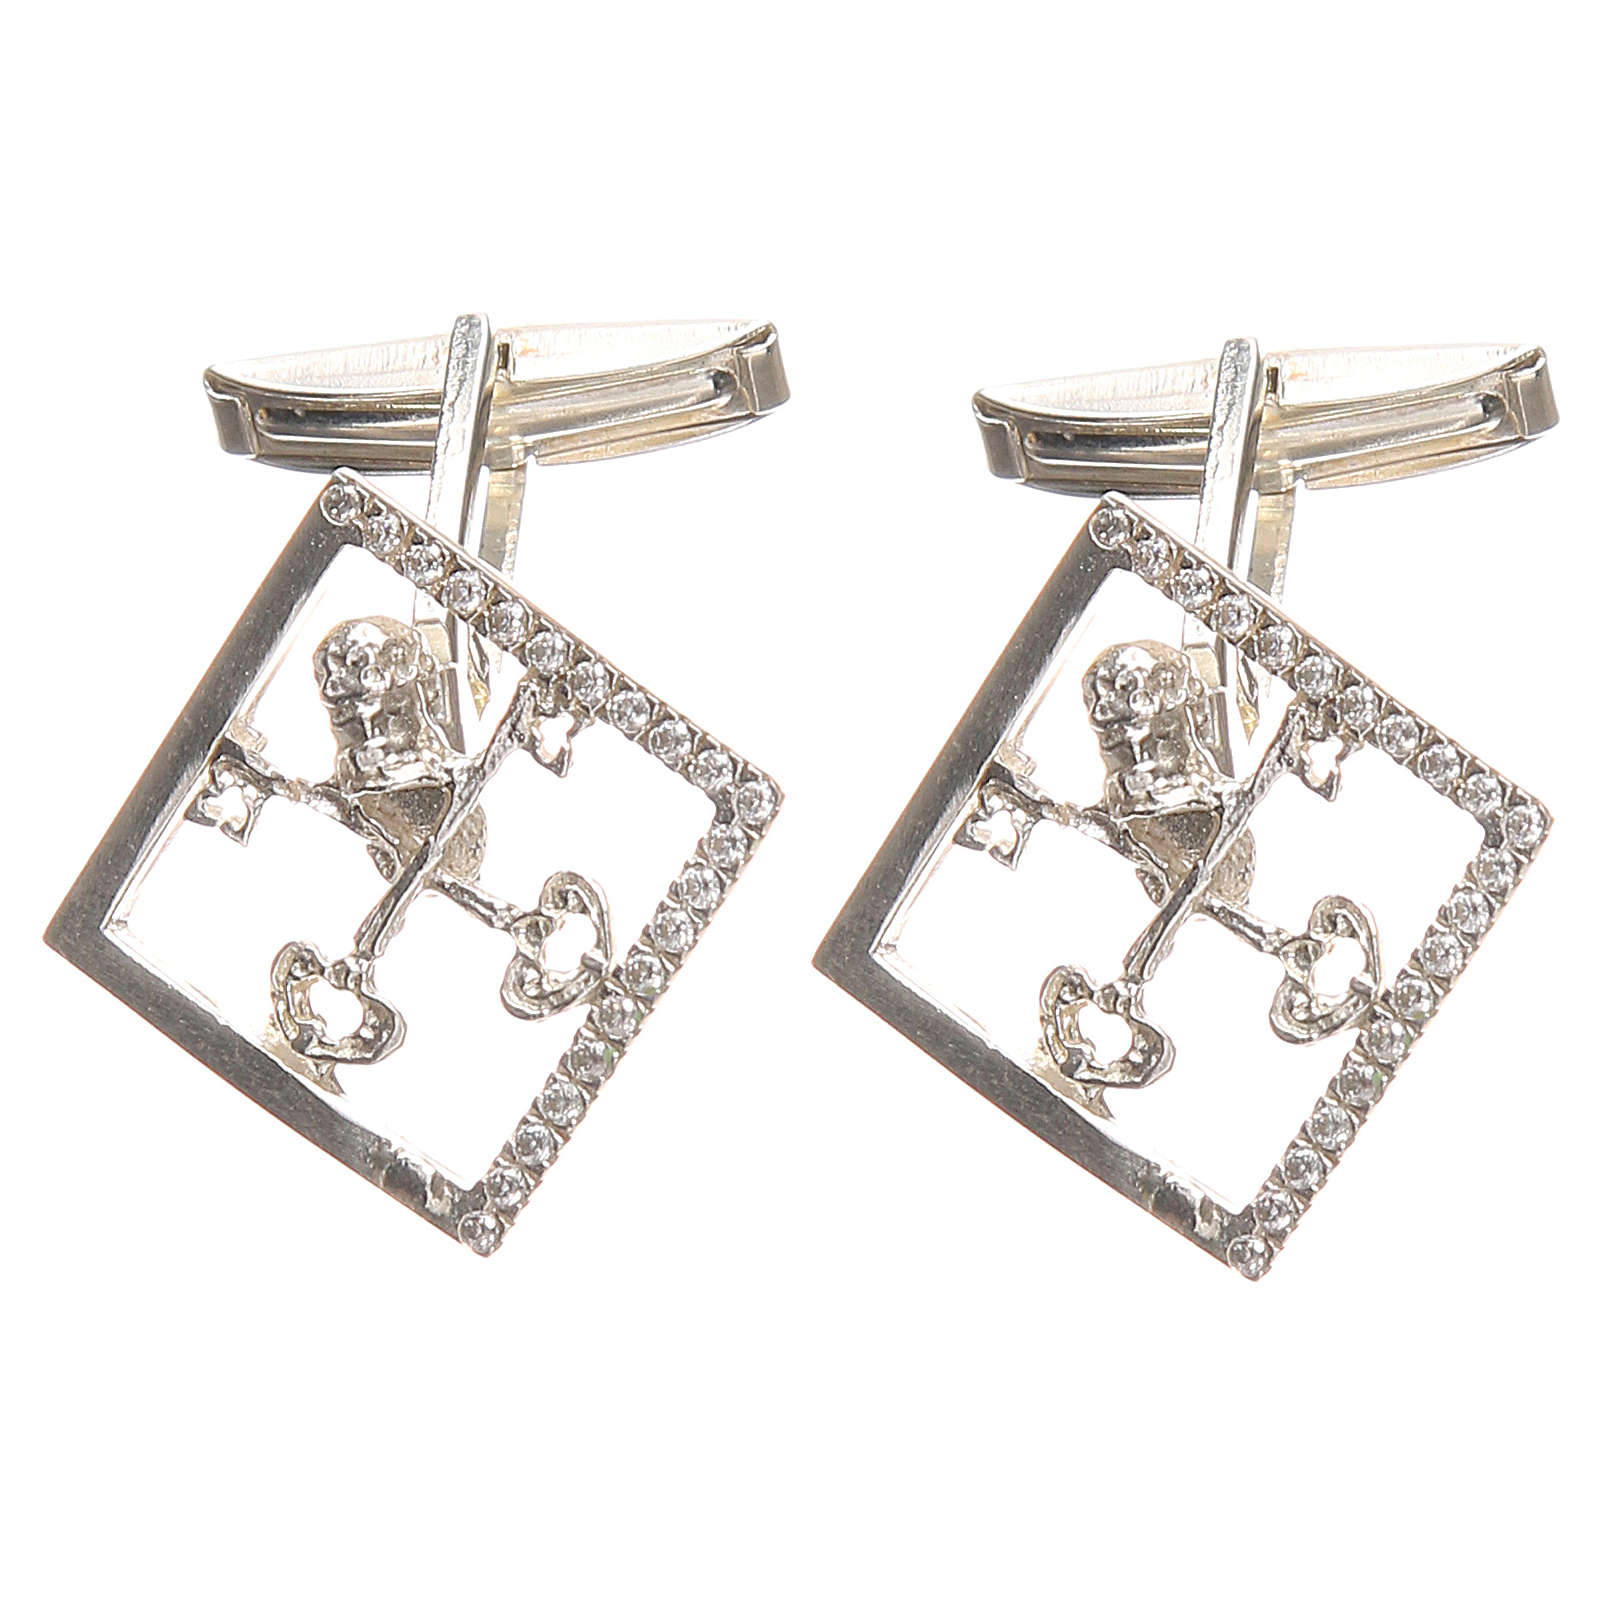 Cufflinks for shirts, Silver 925 Vatican City keys 1,7x1,7cm 4